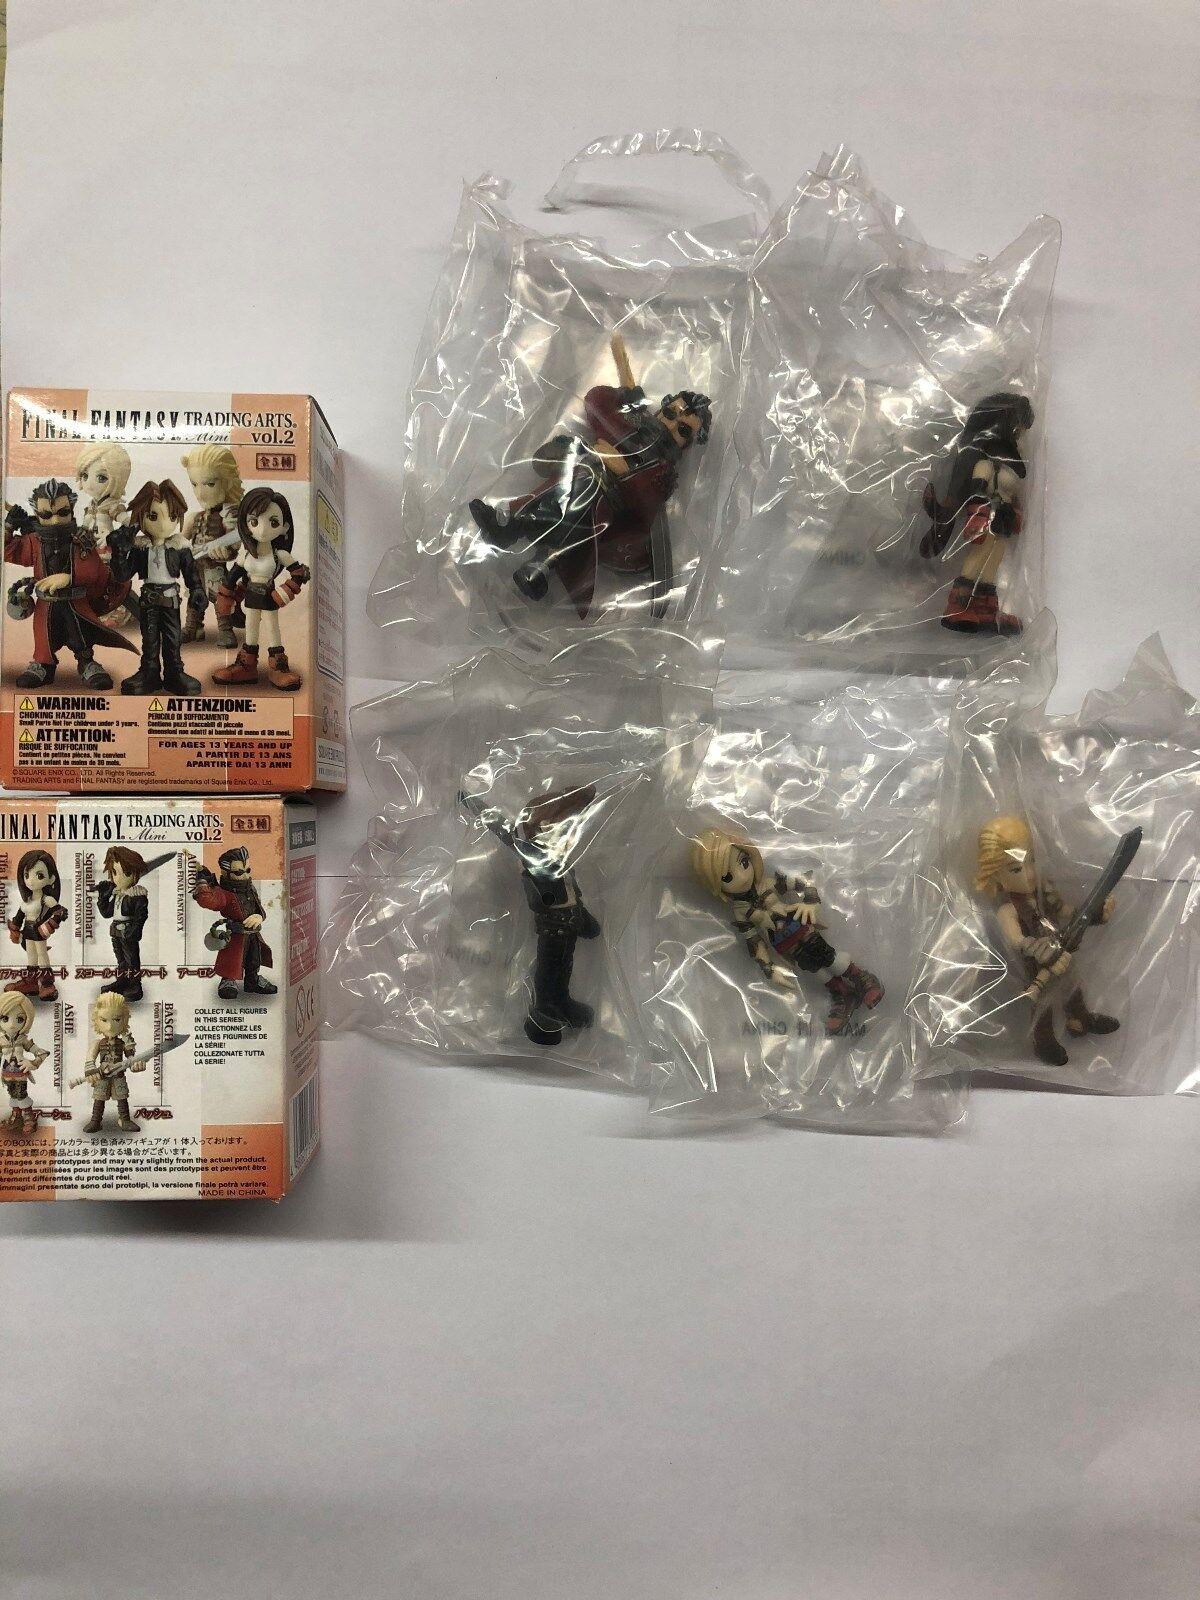 RARE Square Enix Final fantasyc trading arts mini cifra vol.2 full set of 5 pcs